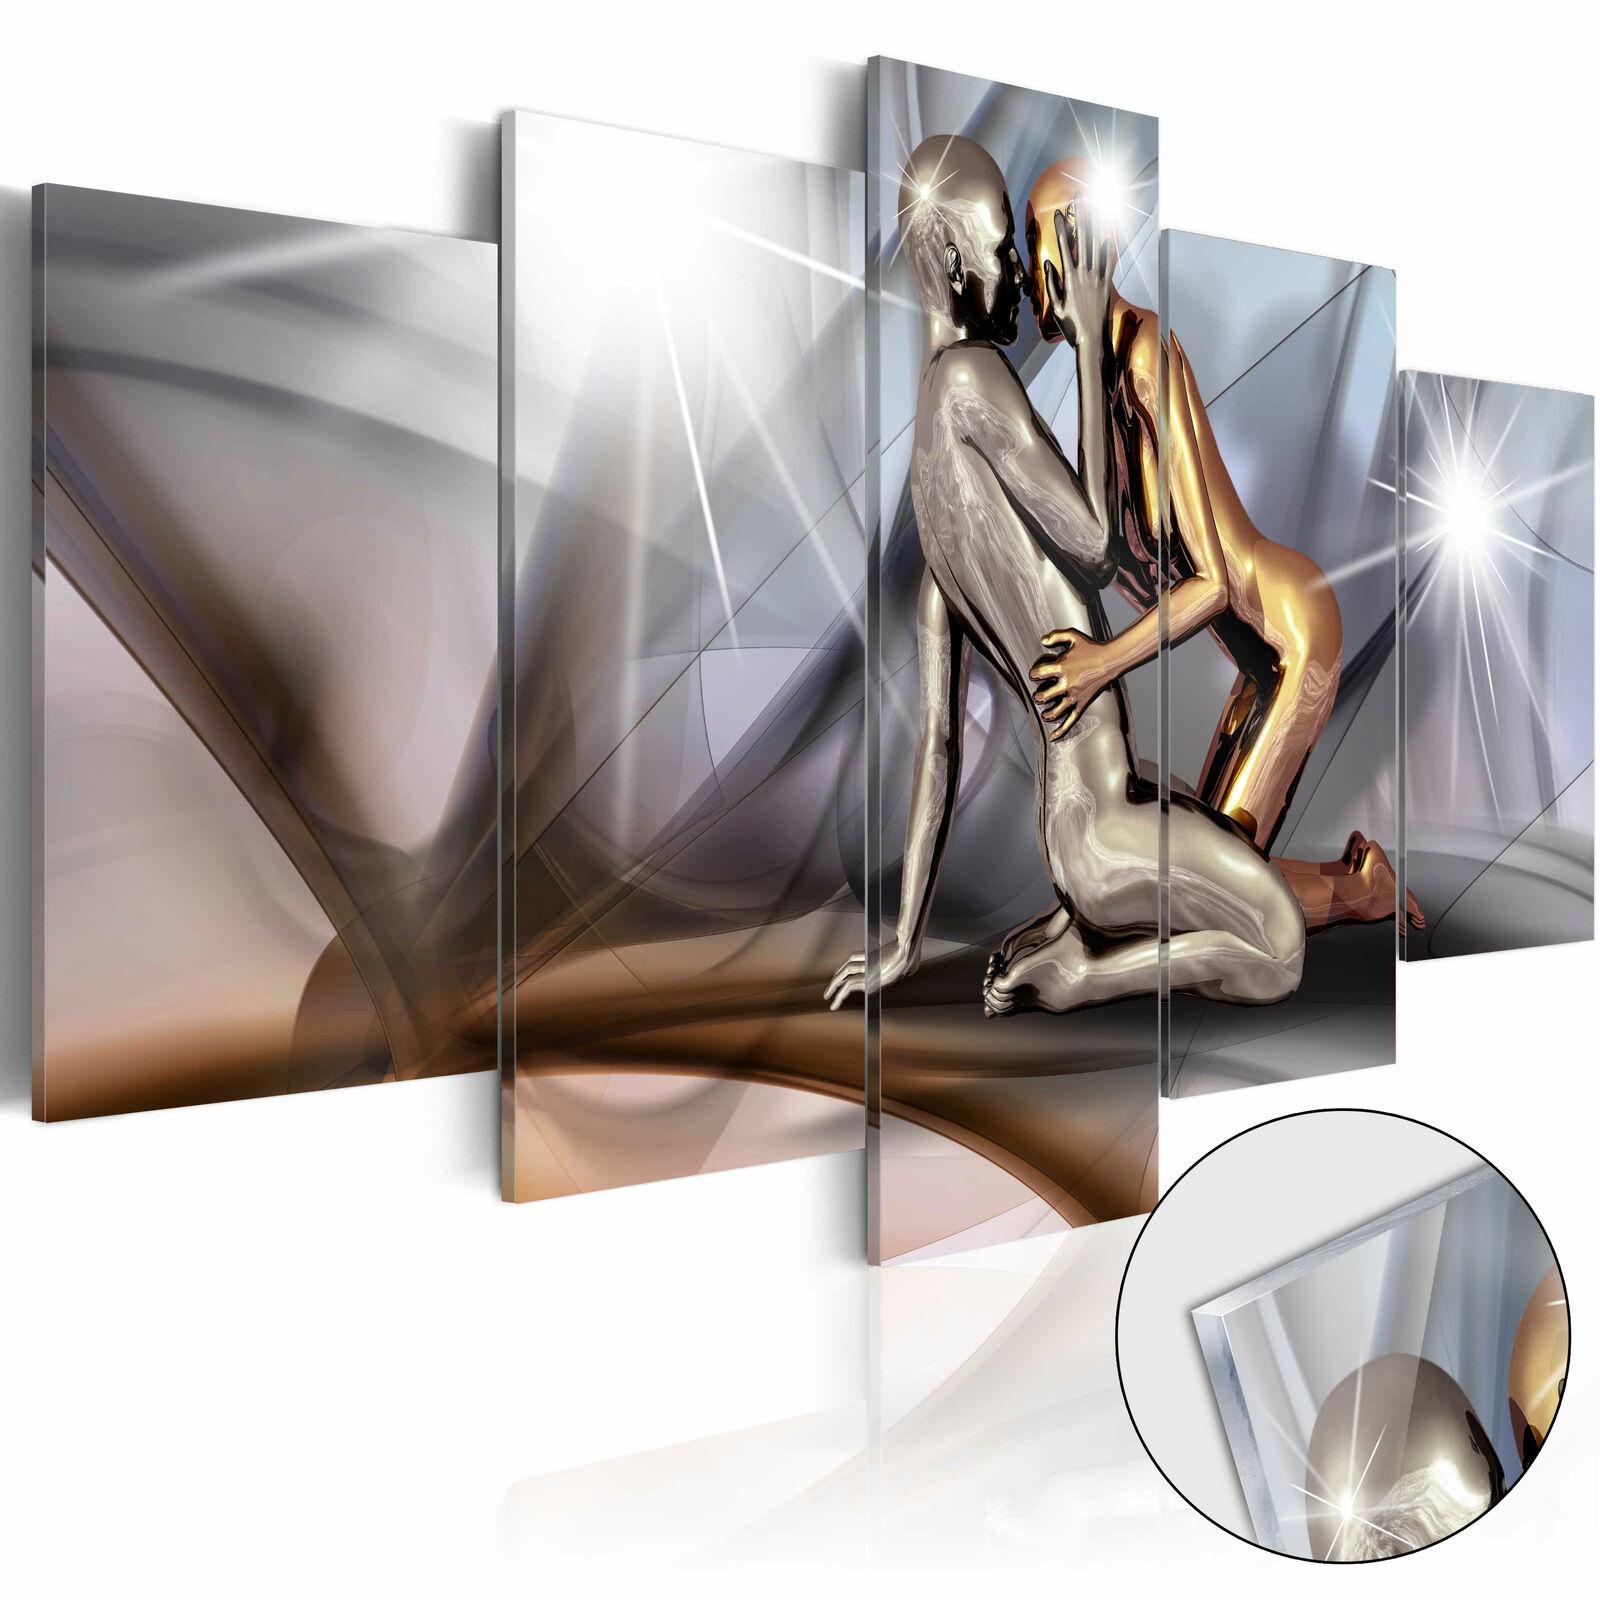 Acrylglasbild Modern Wandbild Glasbilder Bild Liebe Erotik Abstrakt h-A-0019-k-m